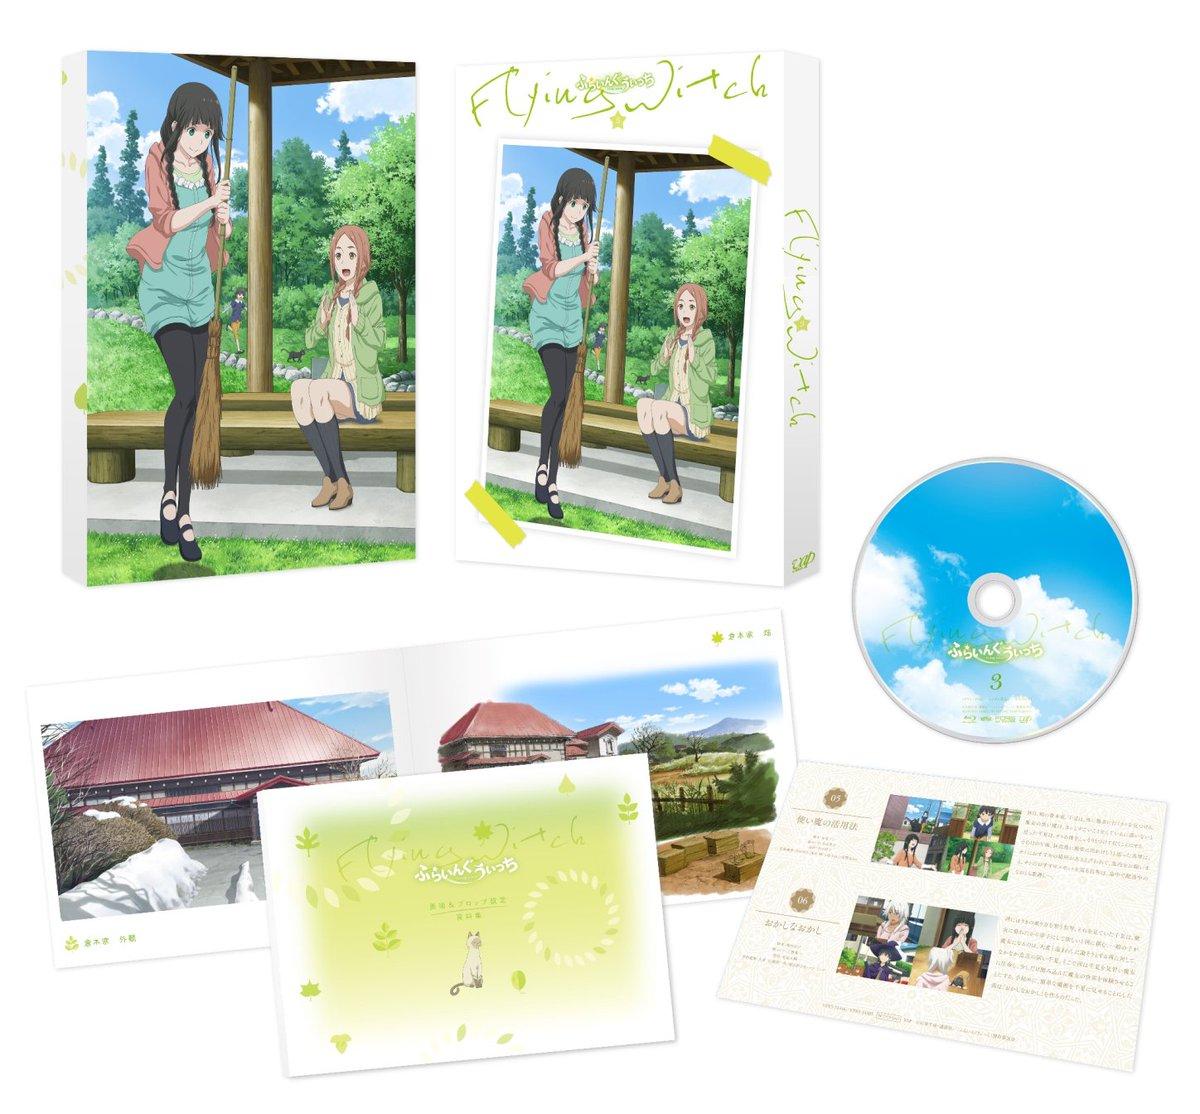 【BD】Vol.3がいよいよ明日発売です!封入特典は「美術&プロップ設定資料集」です。空とぶくじらの設定も掲載されていま